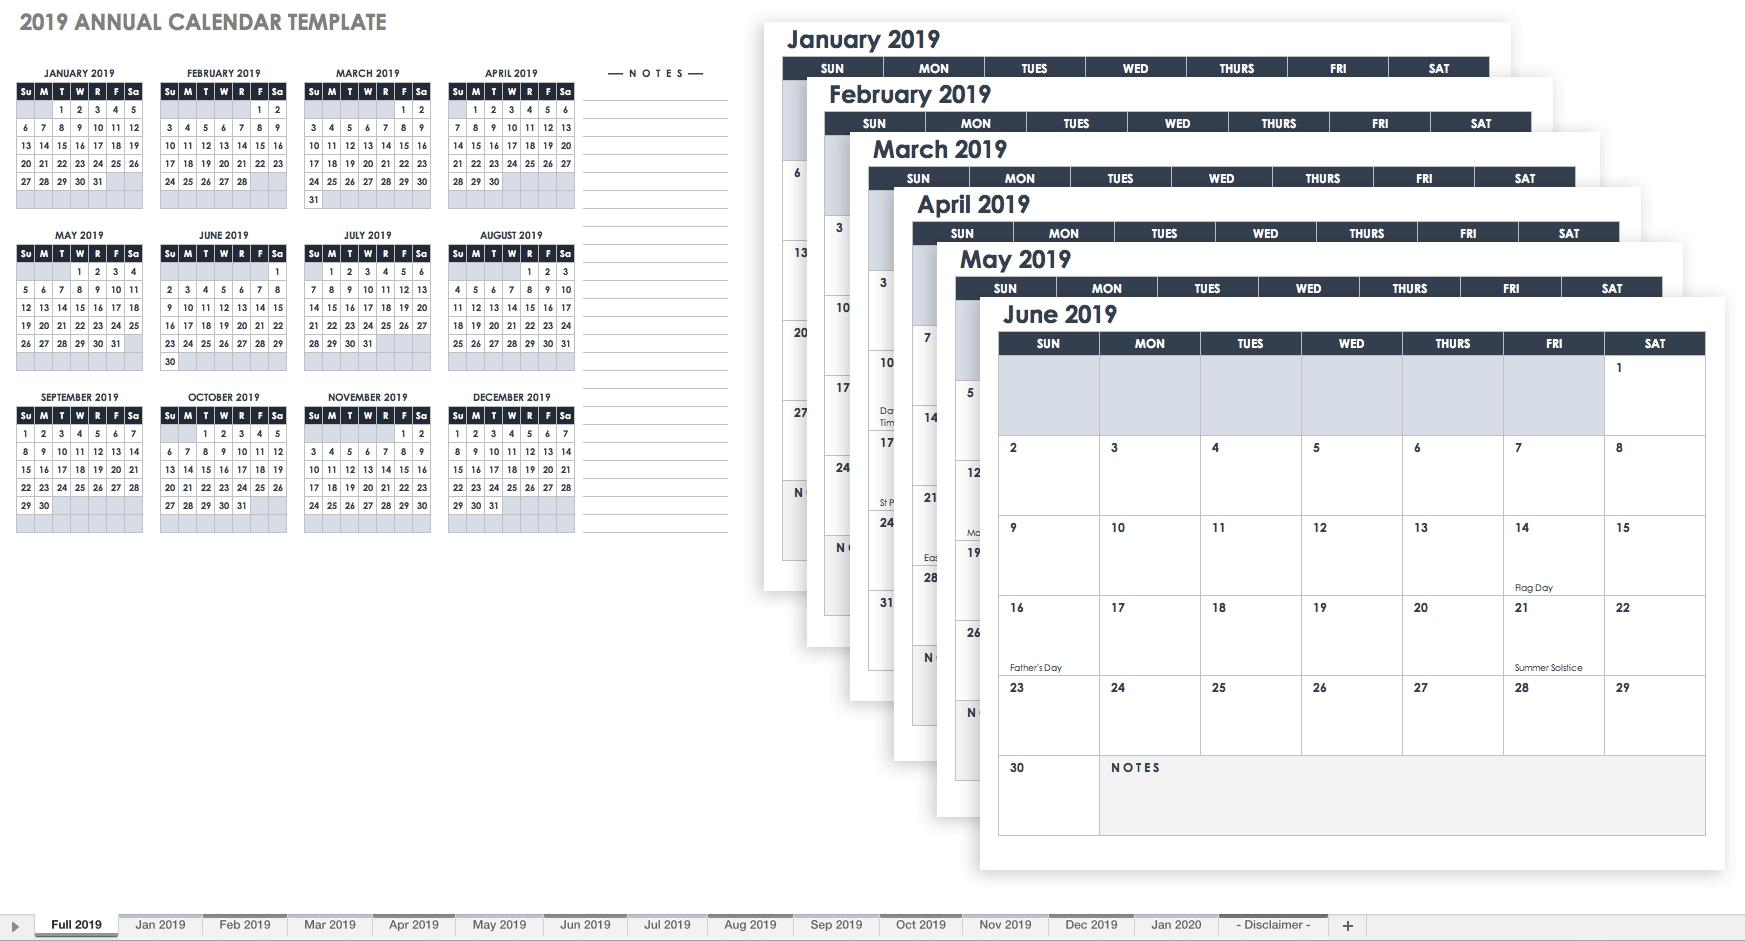 15 Free Monthly Calendar Templates | Smartsheet within Free Printable Blank Monthly Calendar Templates